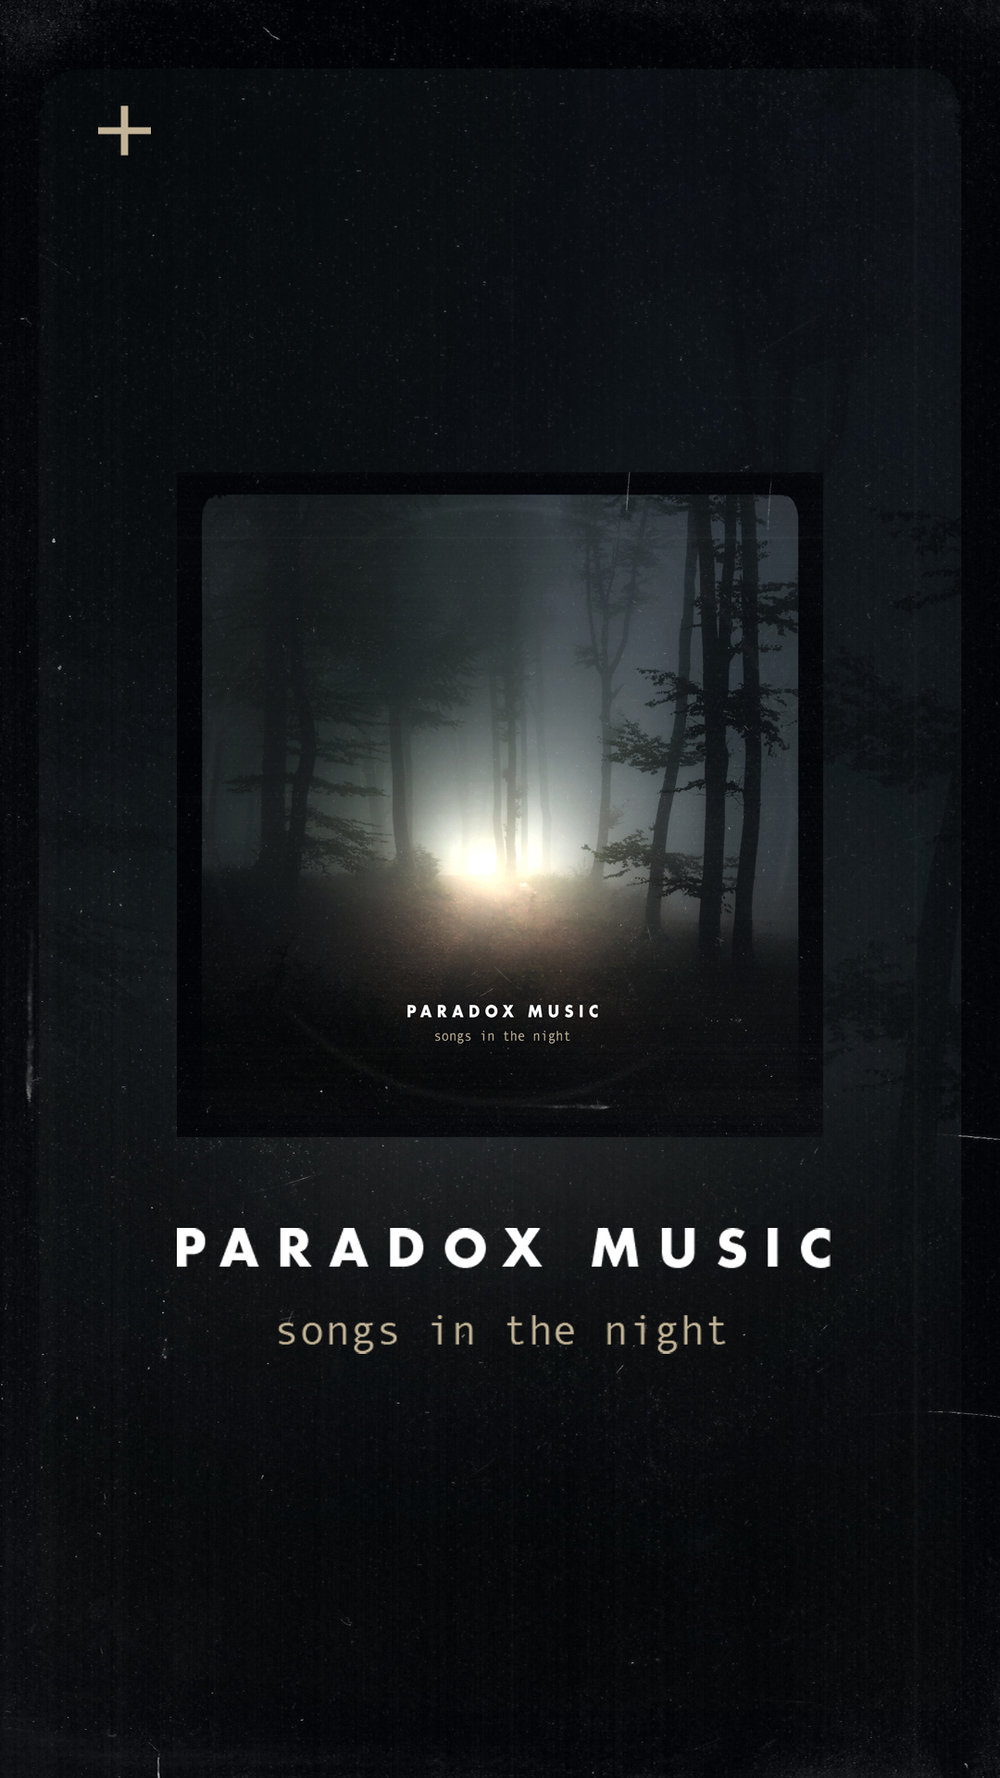 SONGS_1080x1920_Album_withTitle.jpg